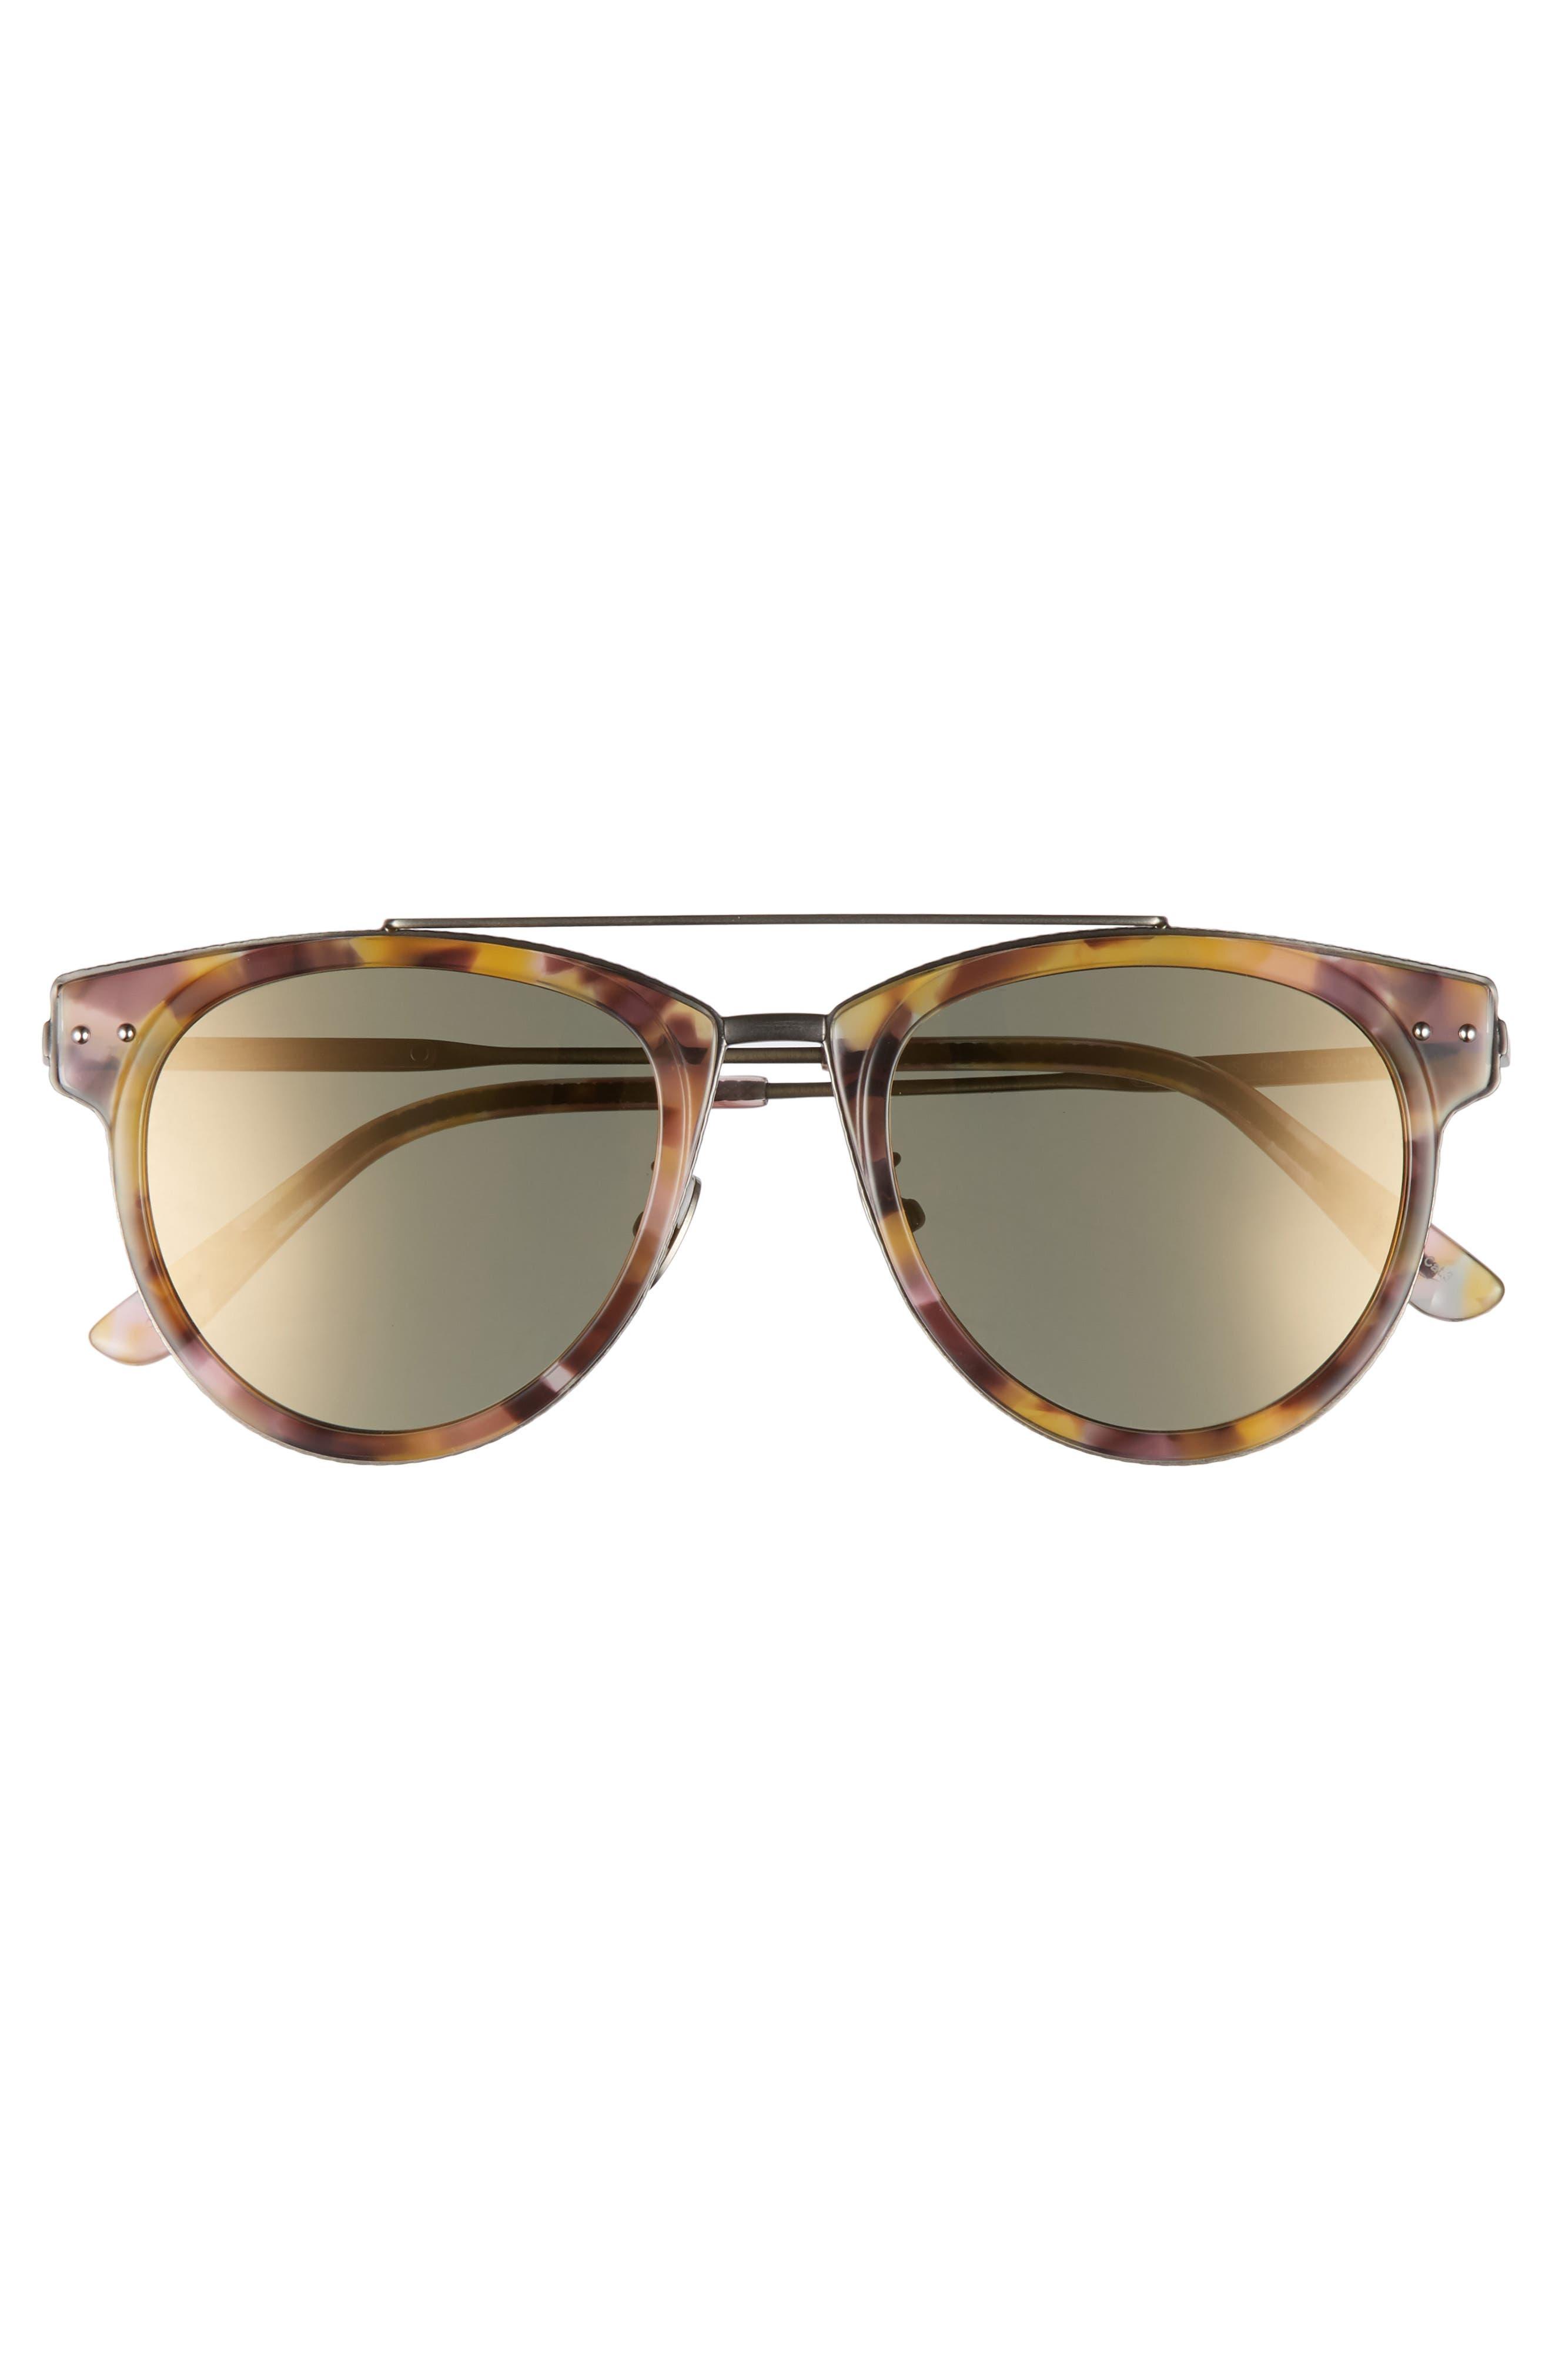 50mm Sunglasses,                             Alternate thumbnail 3, color,                             AVANA BROWN